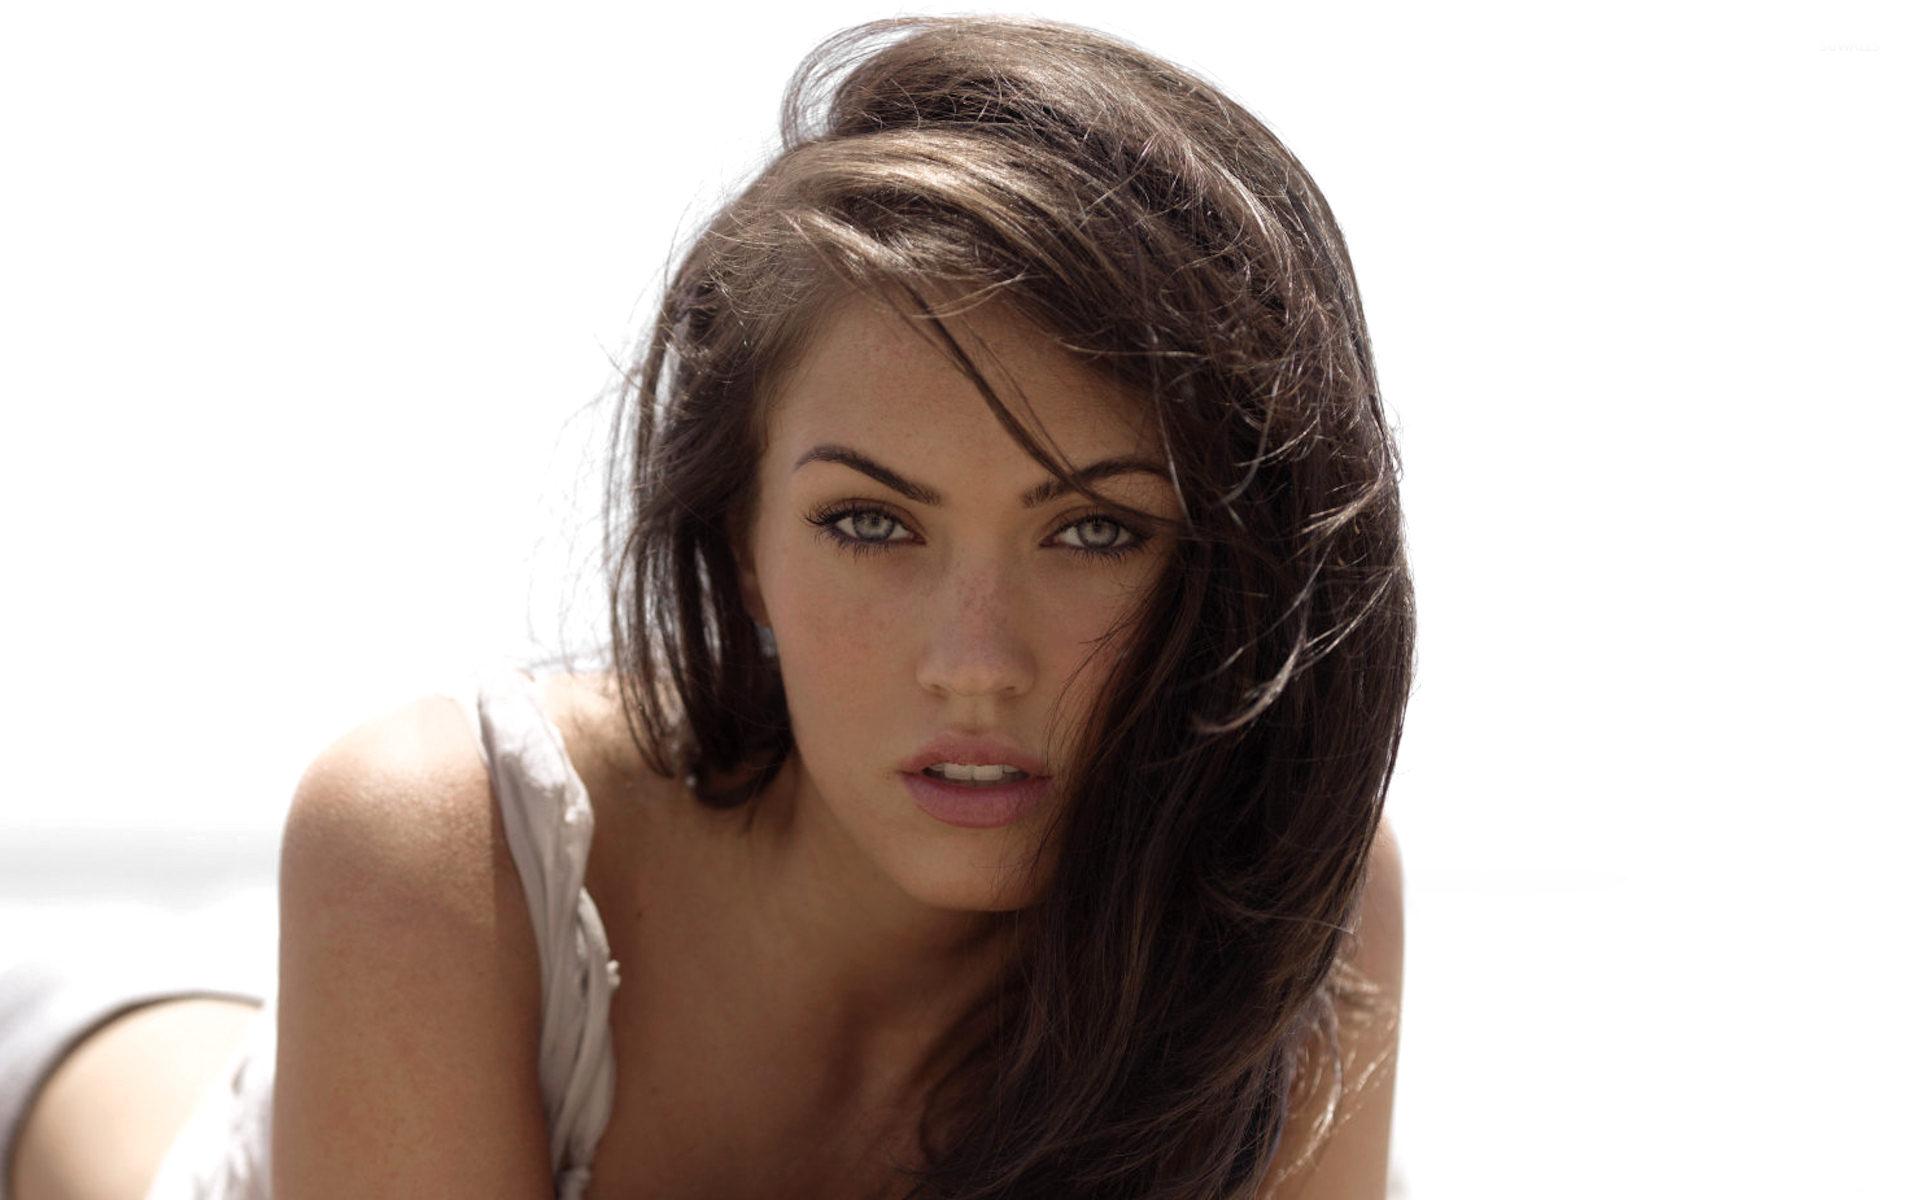 pictures 15. Megan Fox